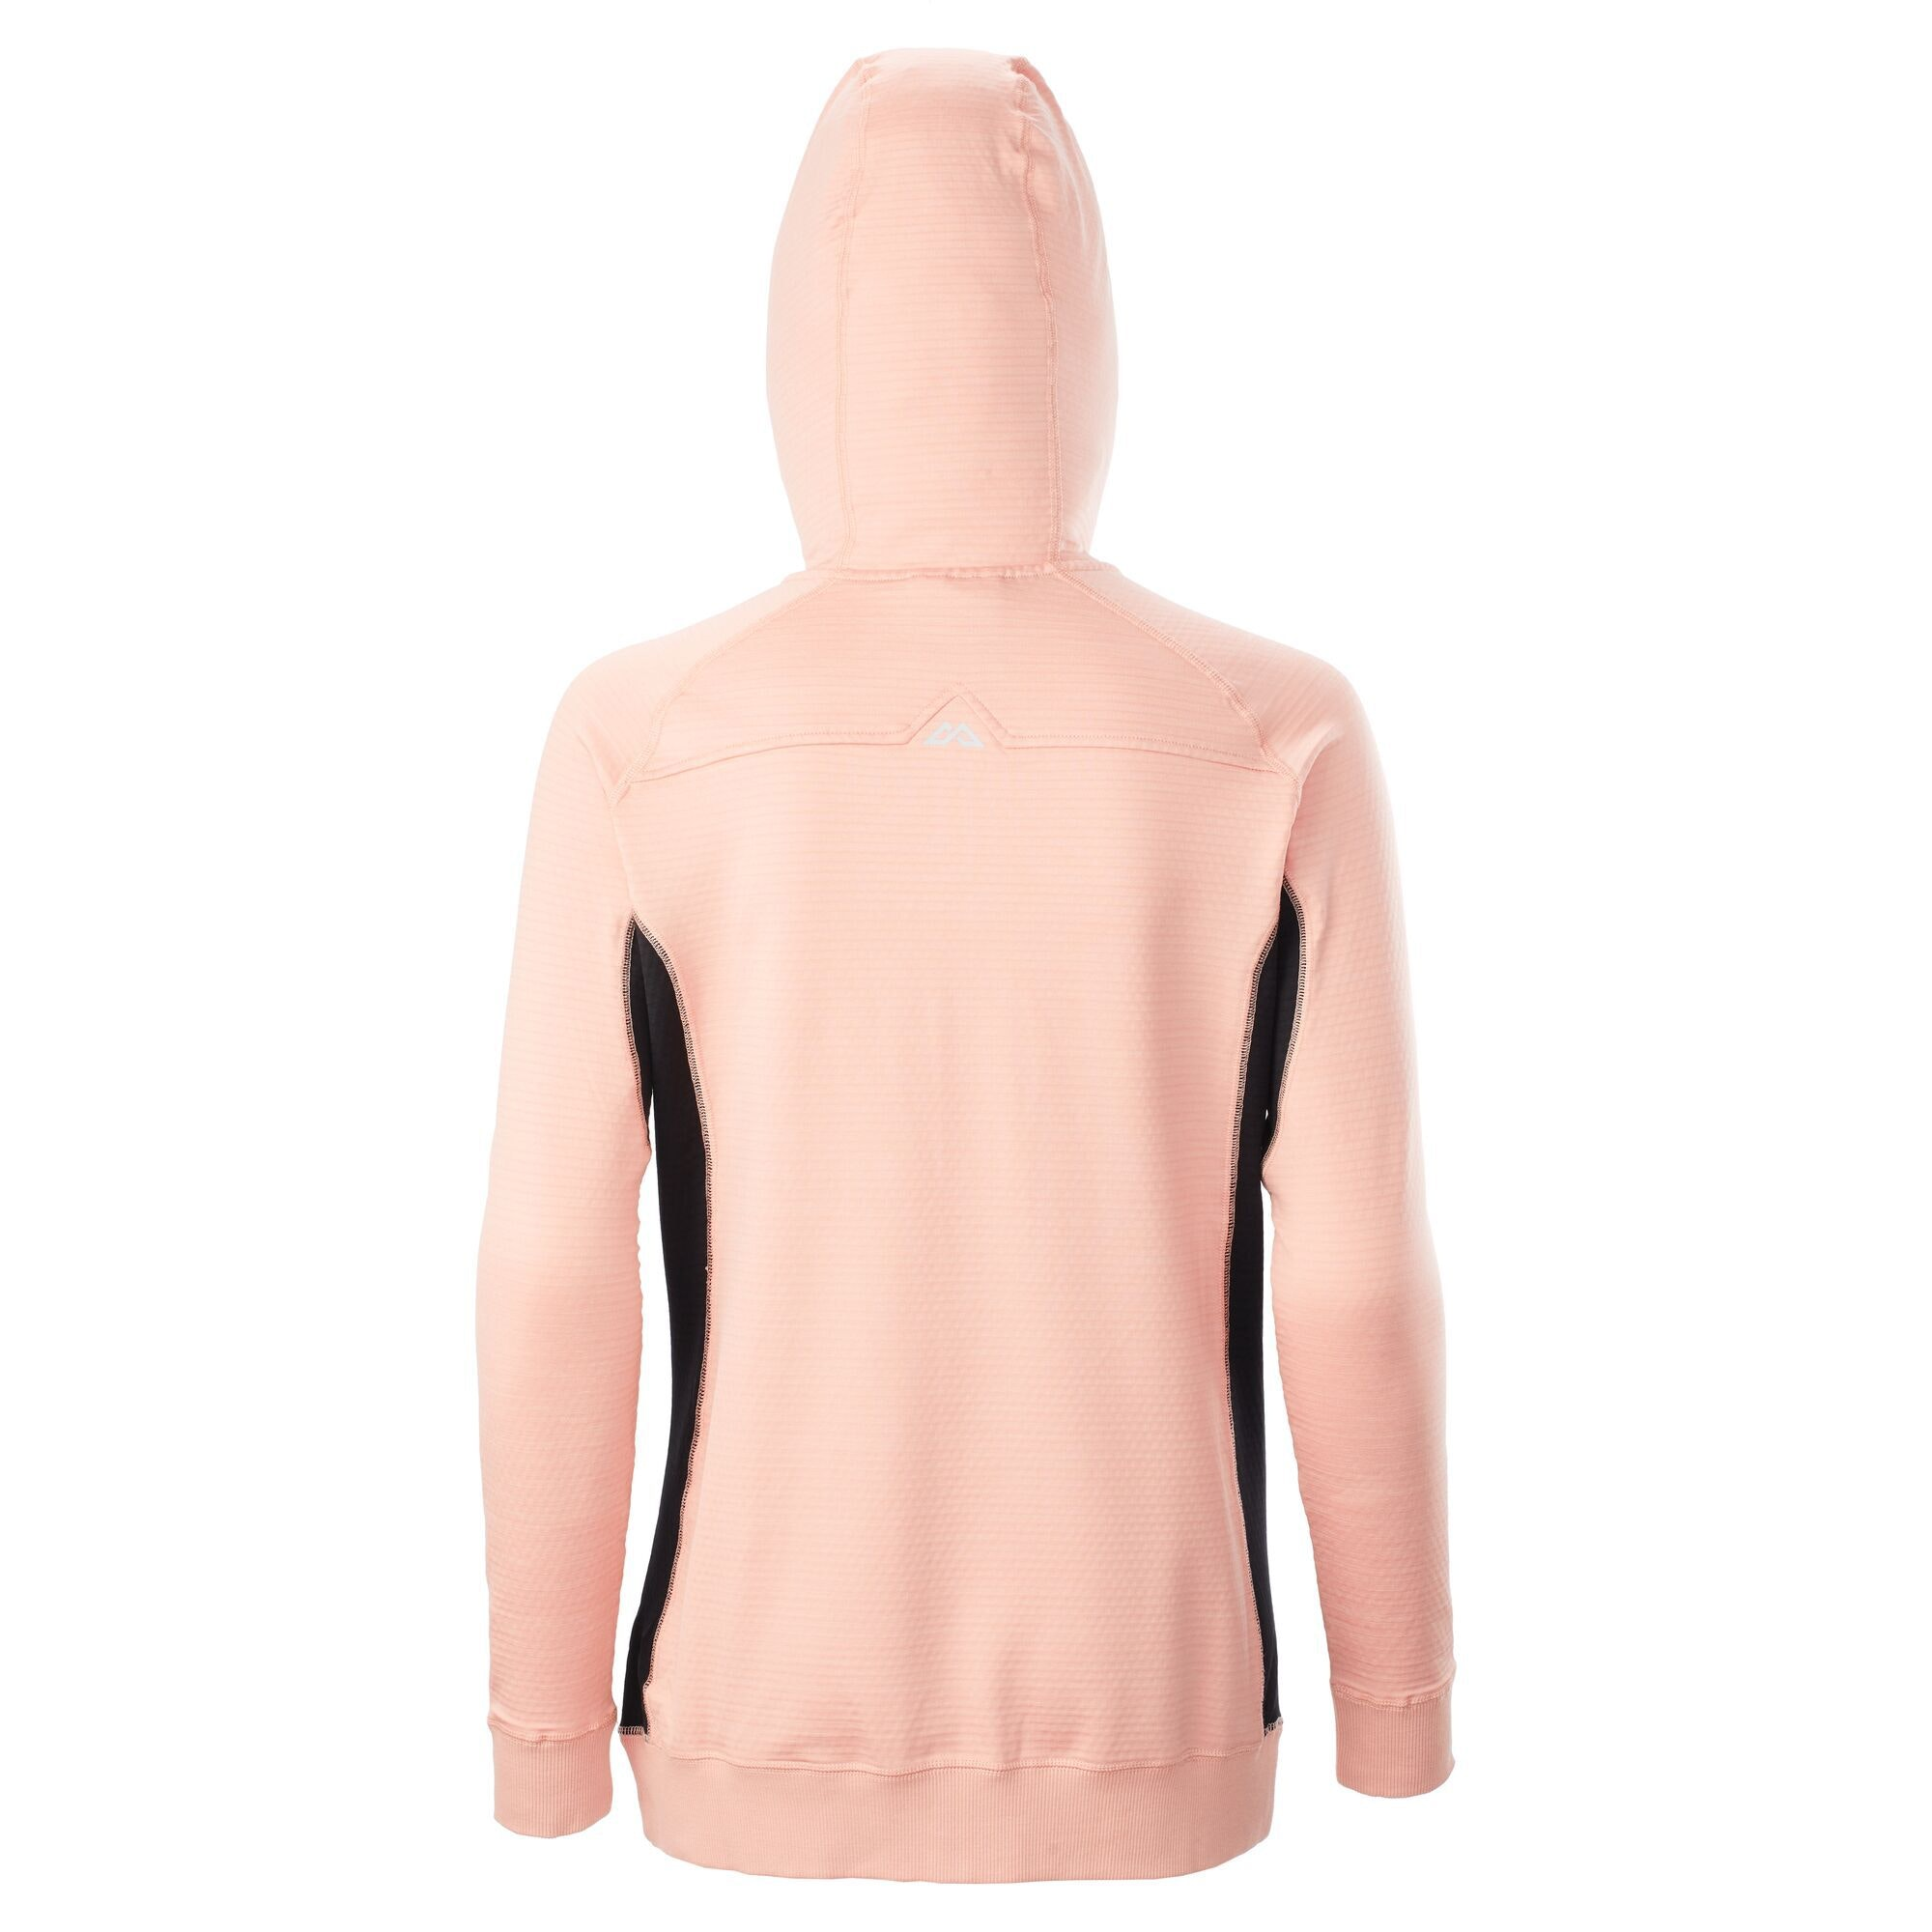 NEW-Kathmandu-Acota-Women-s-Hooded-Fleece-Lightweight-Breathable-Outdoor-Jacket thumbnail 32